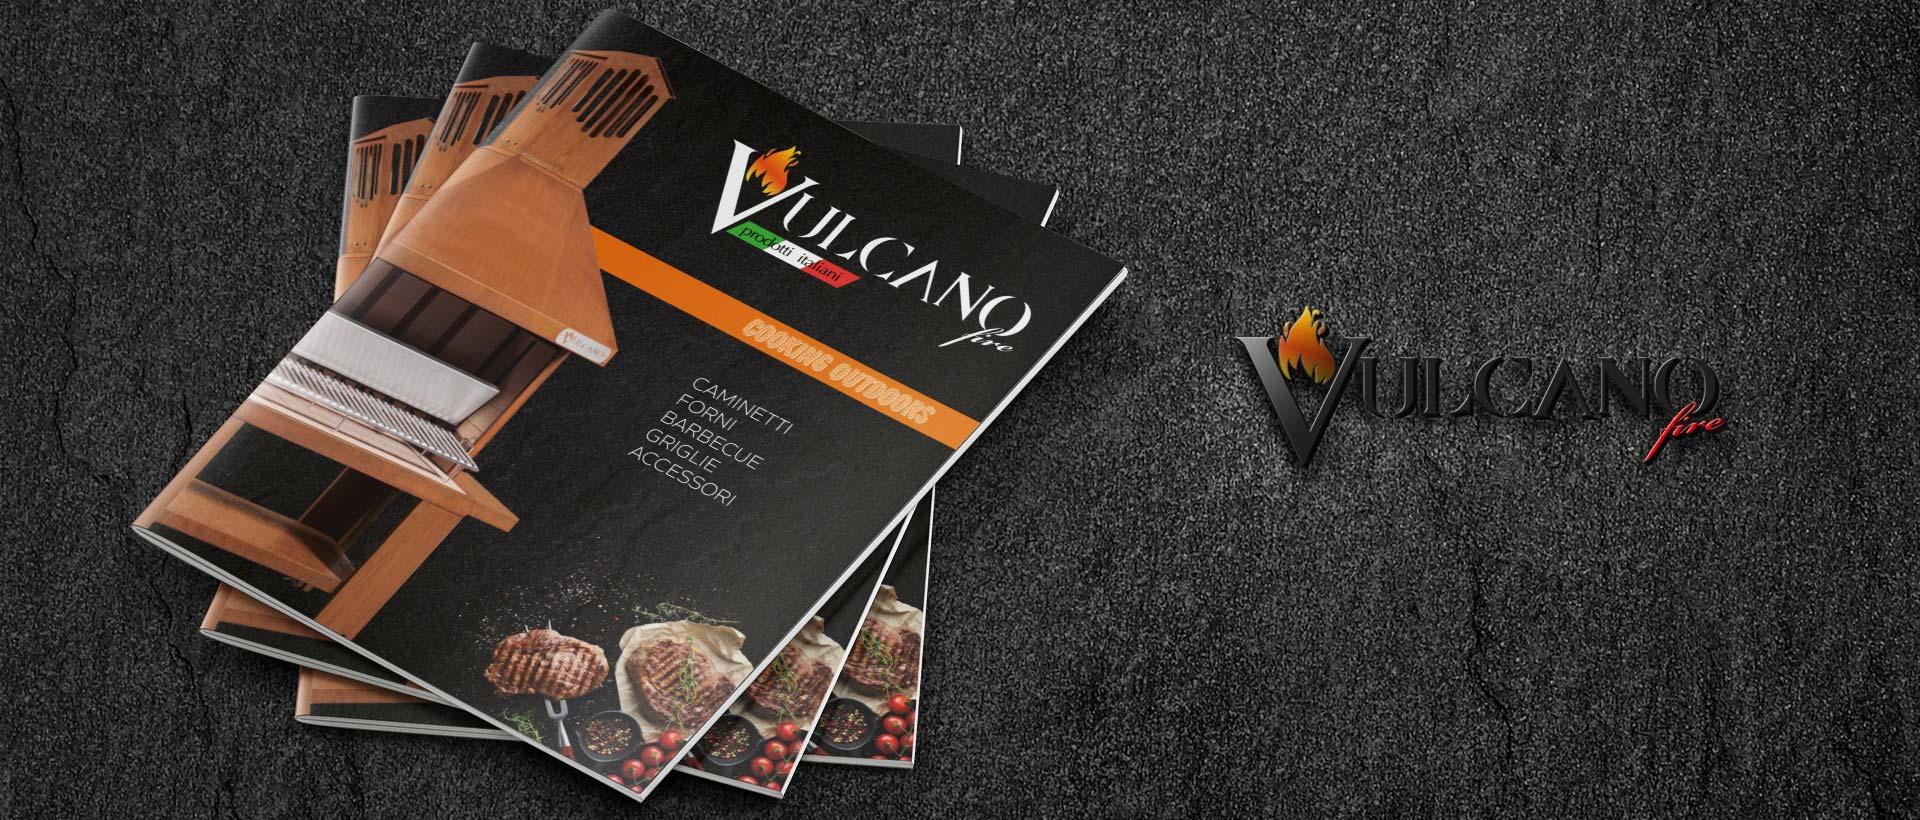 Vulcano Fire